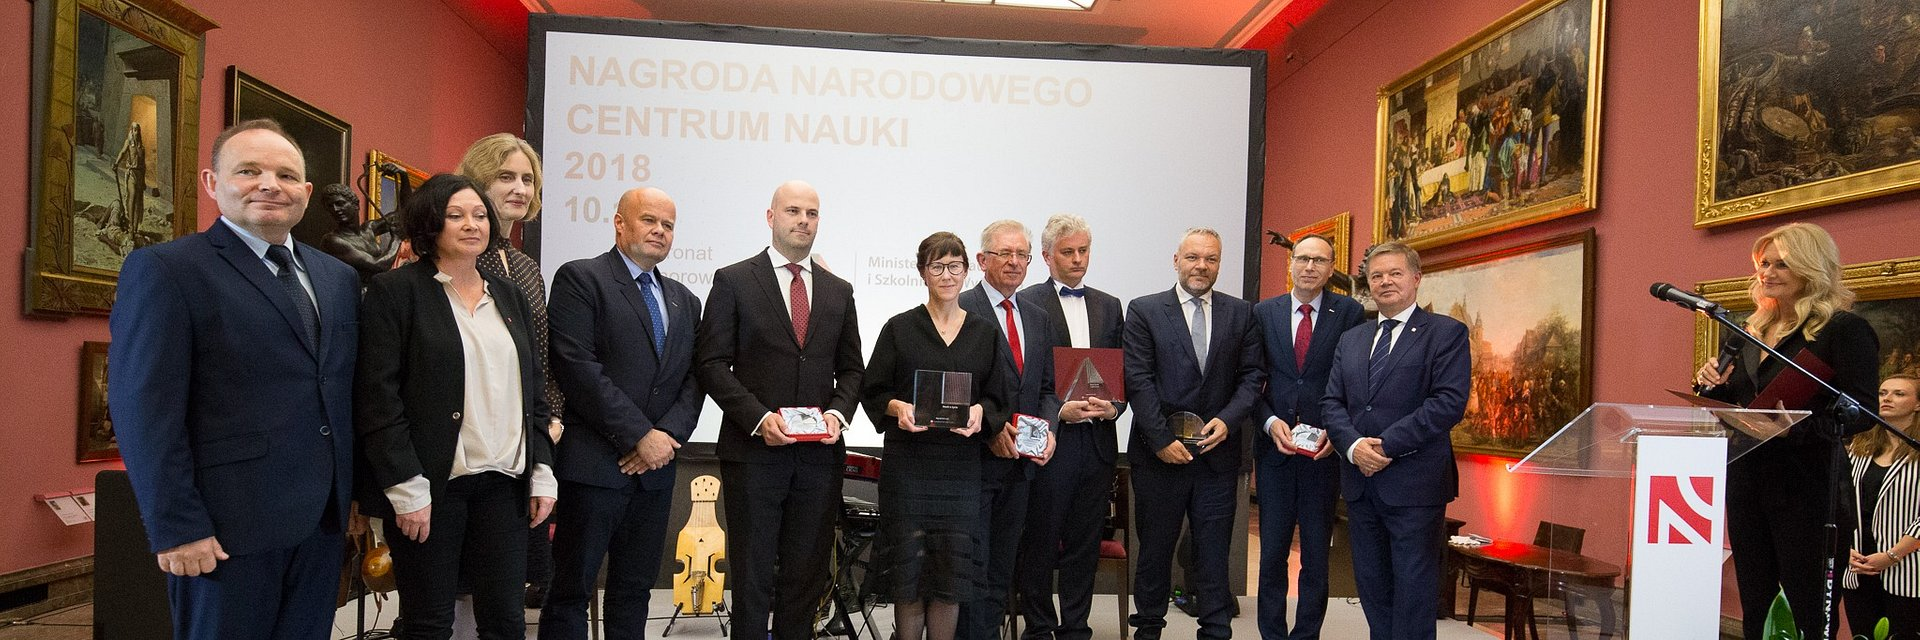 Adamed Sponsorem Nagrody Narodowego Centrum Nauki